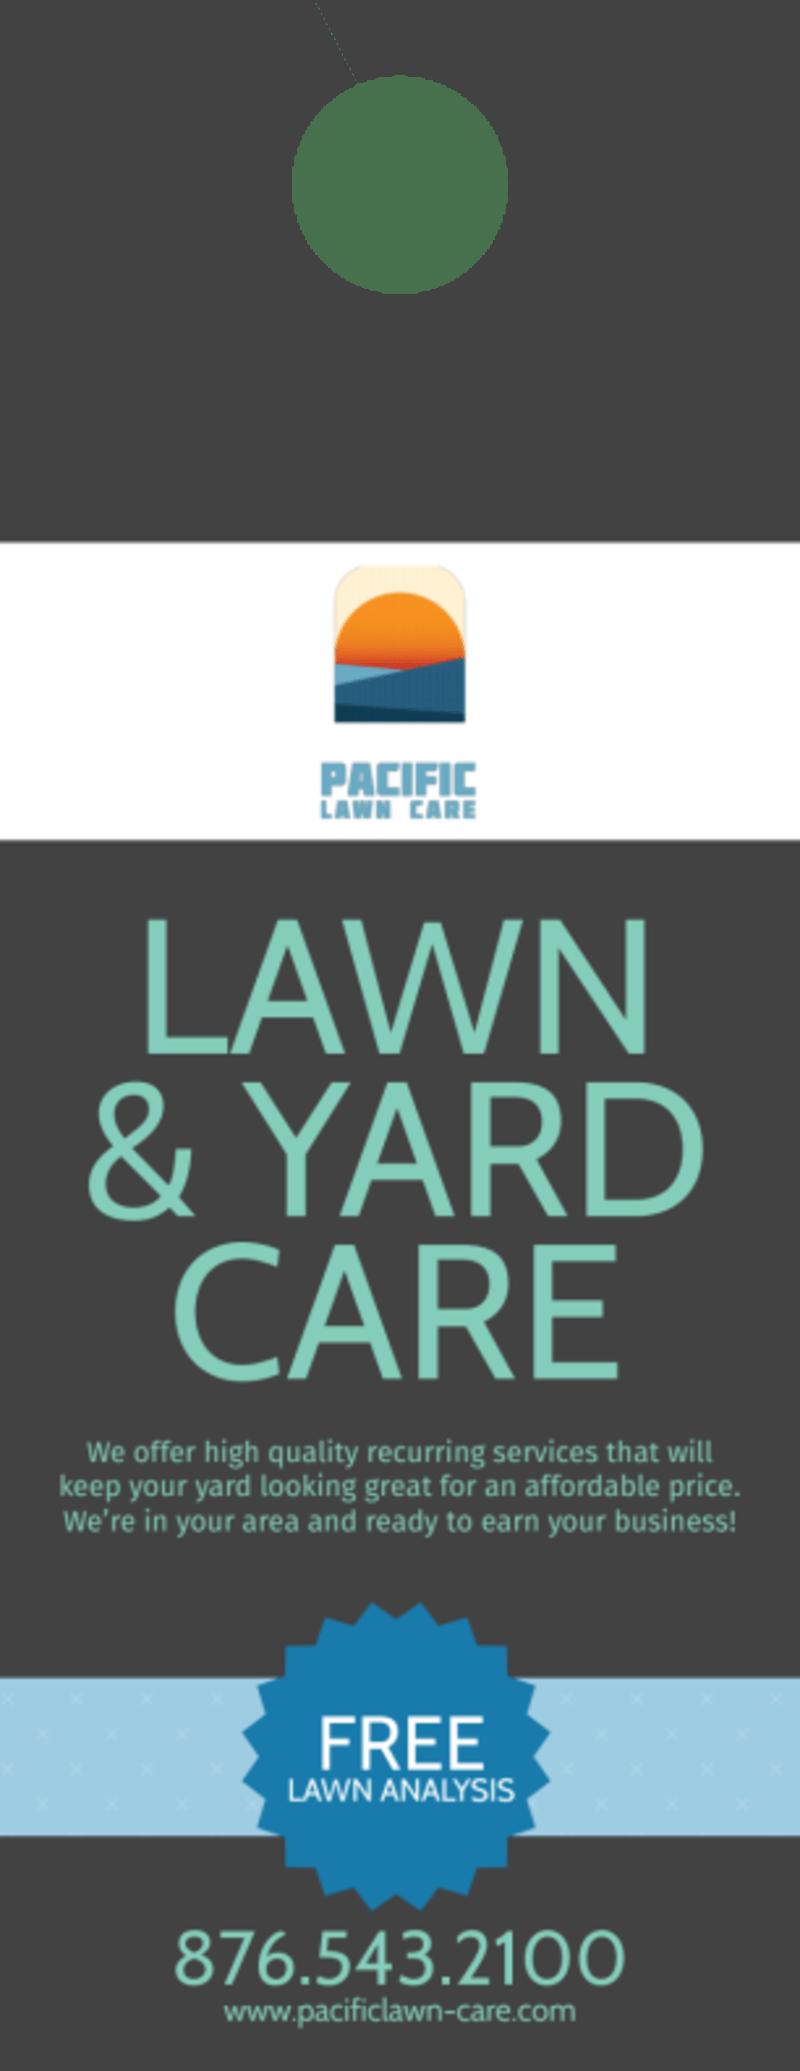 Pacific Lawn & Yard Care Door Hanger Template Preview 2